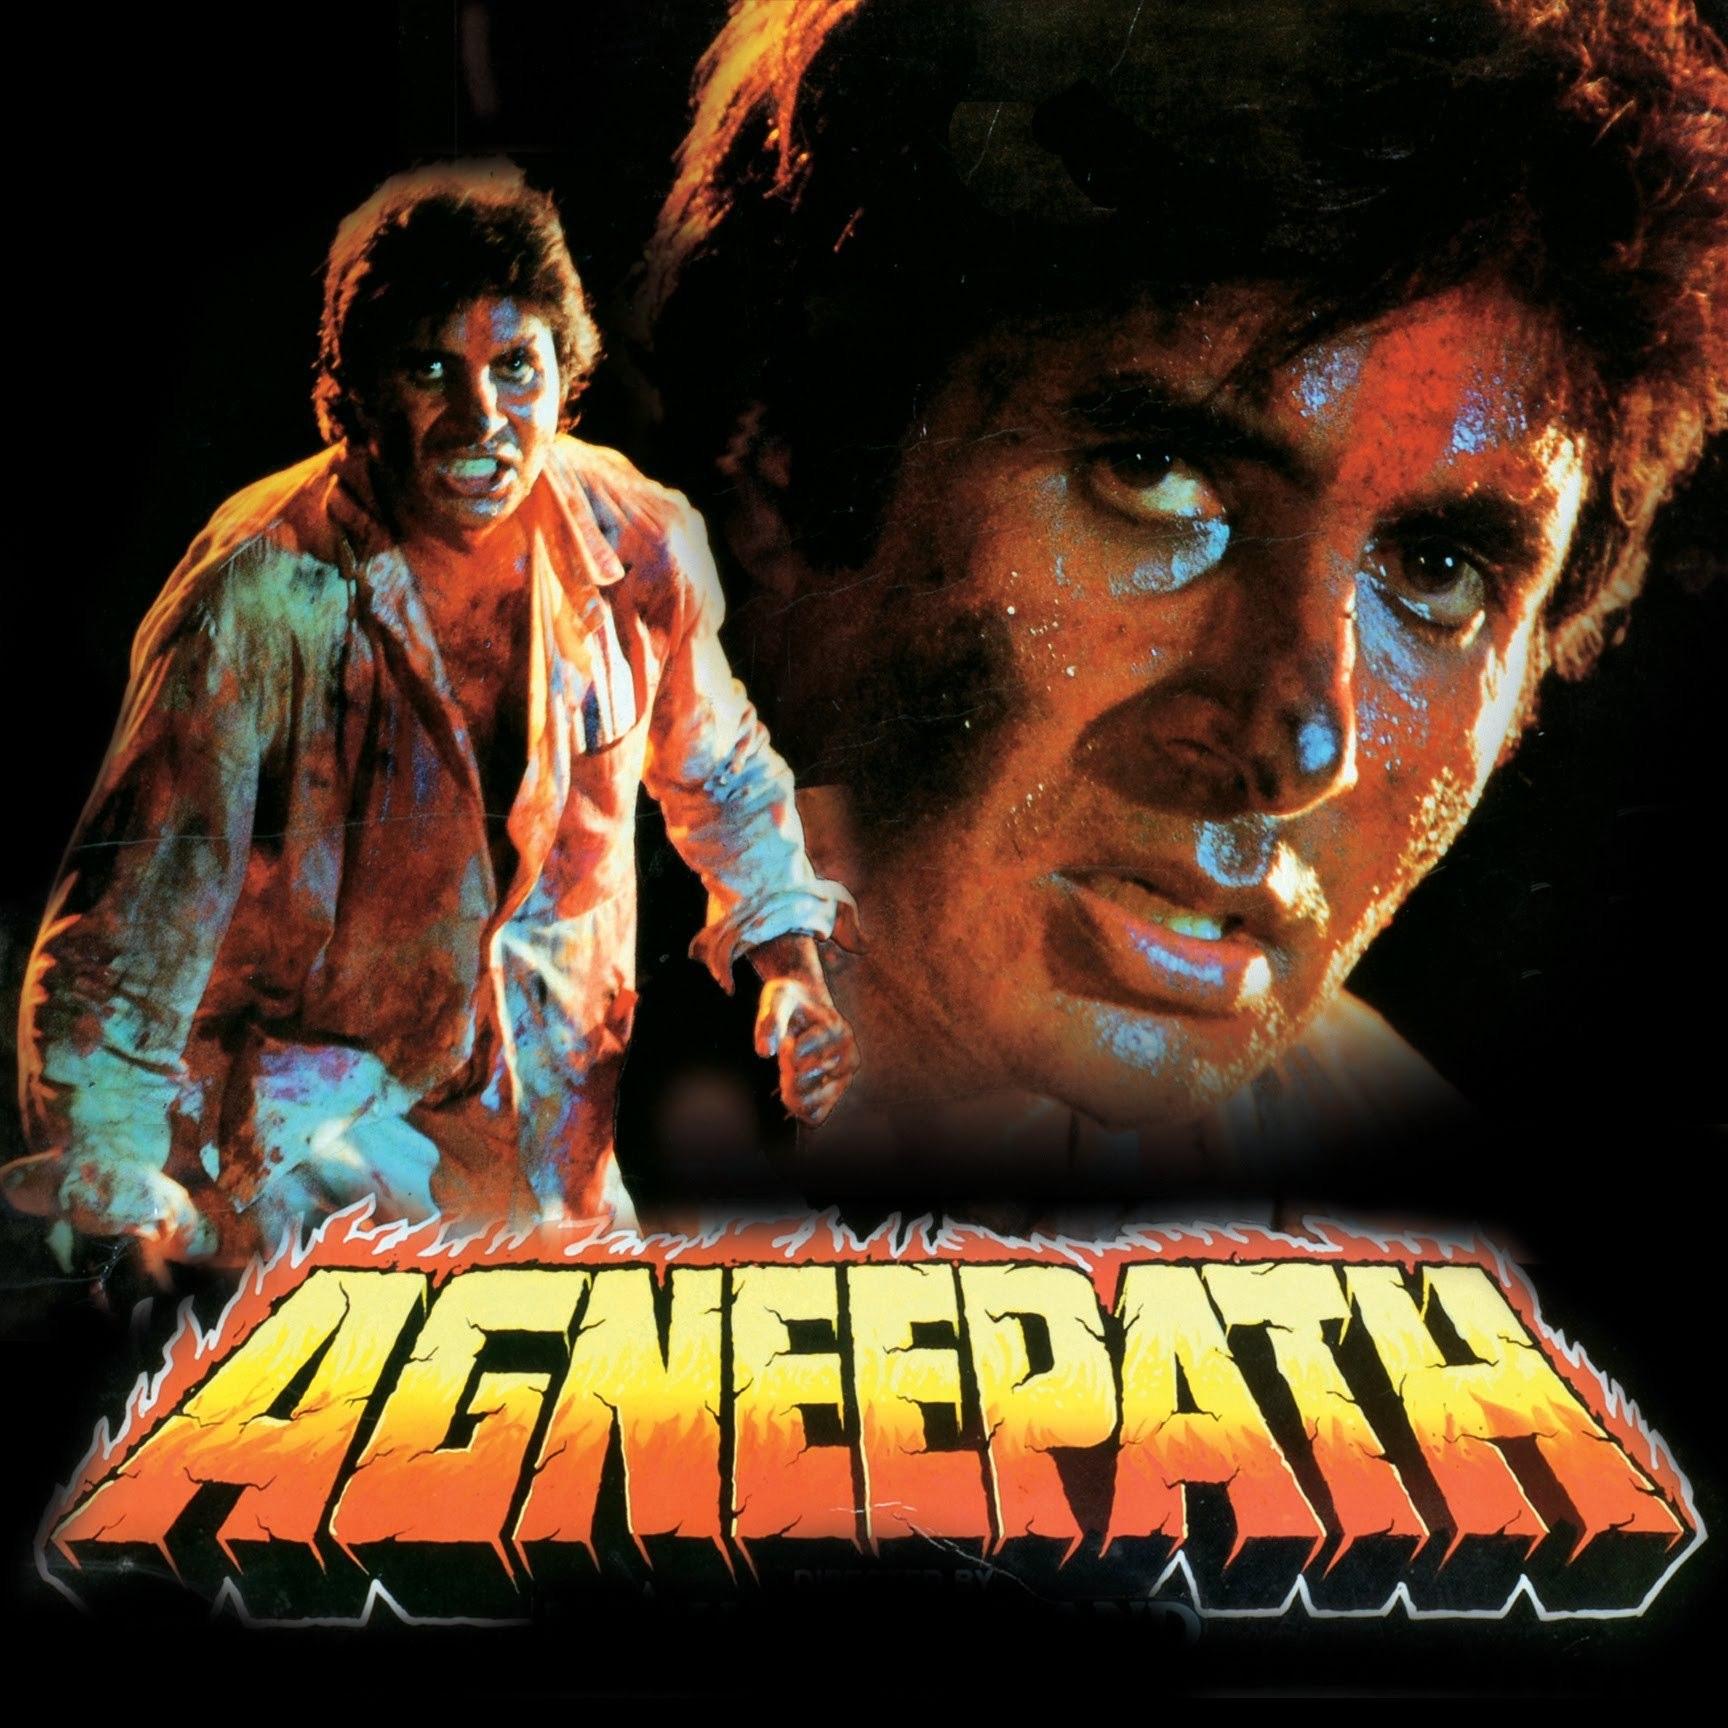 SRK's, look, style, Raees, reminds, Amitabh Bachchan, Agneepath